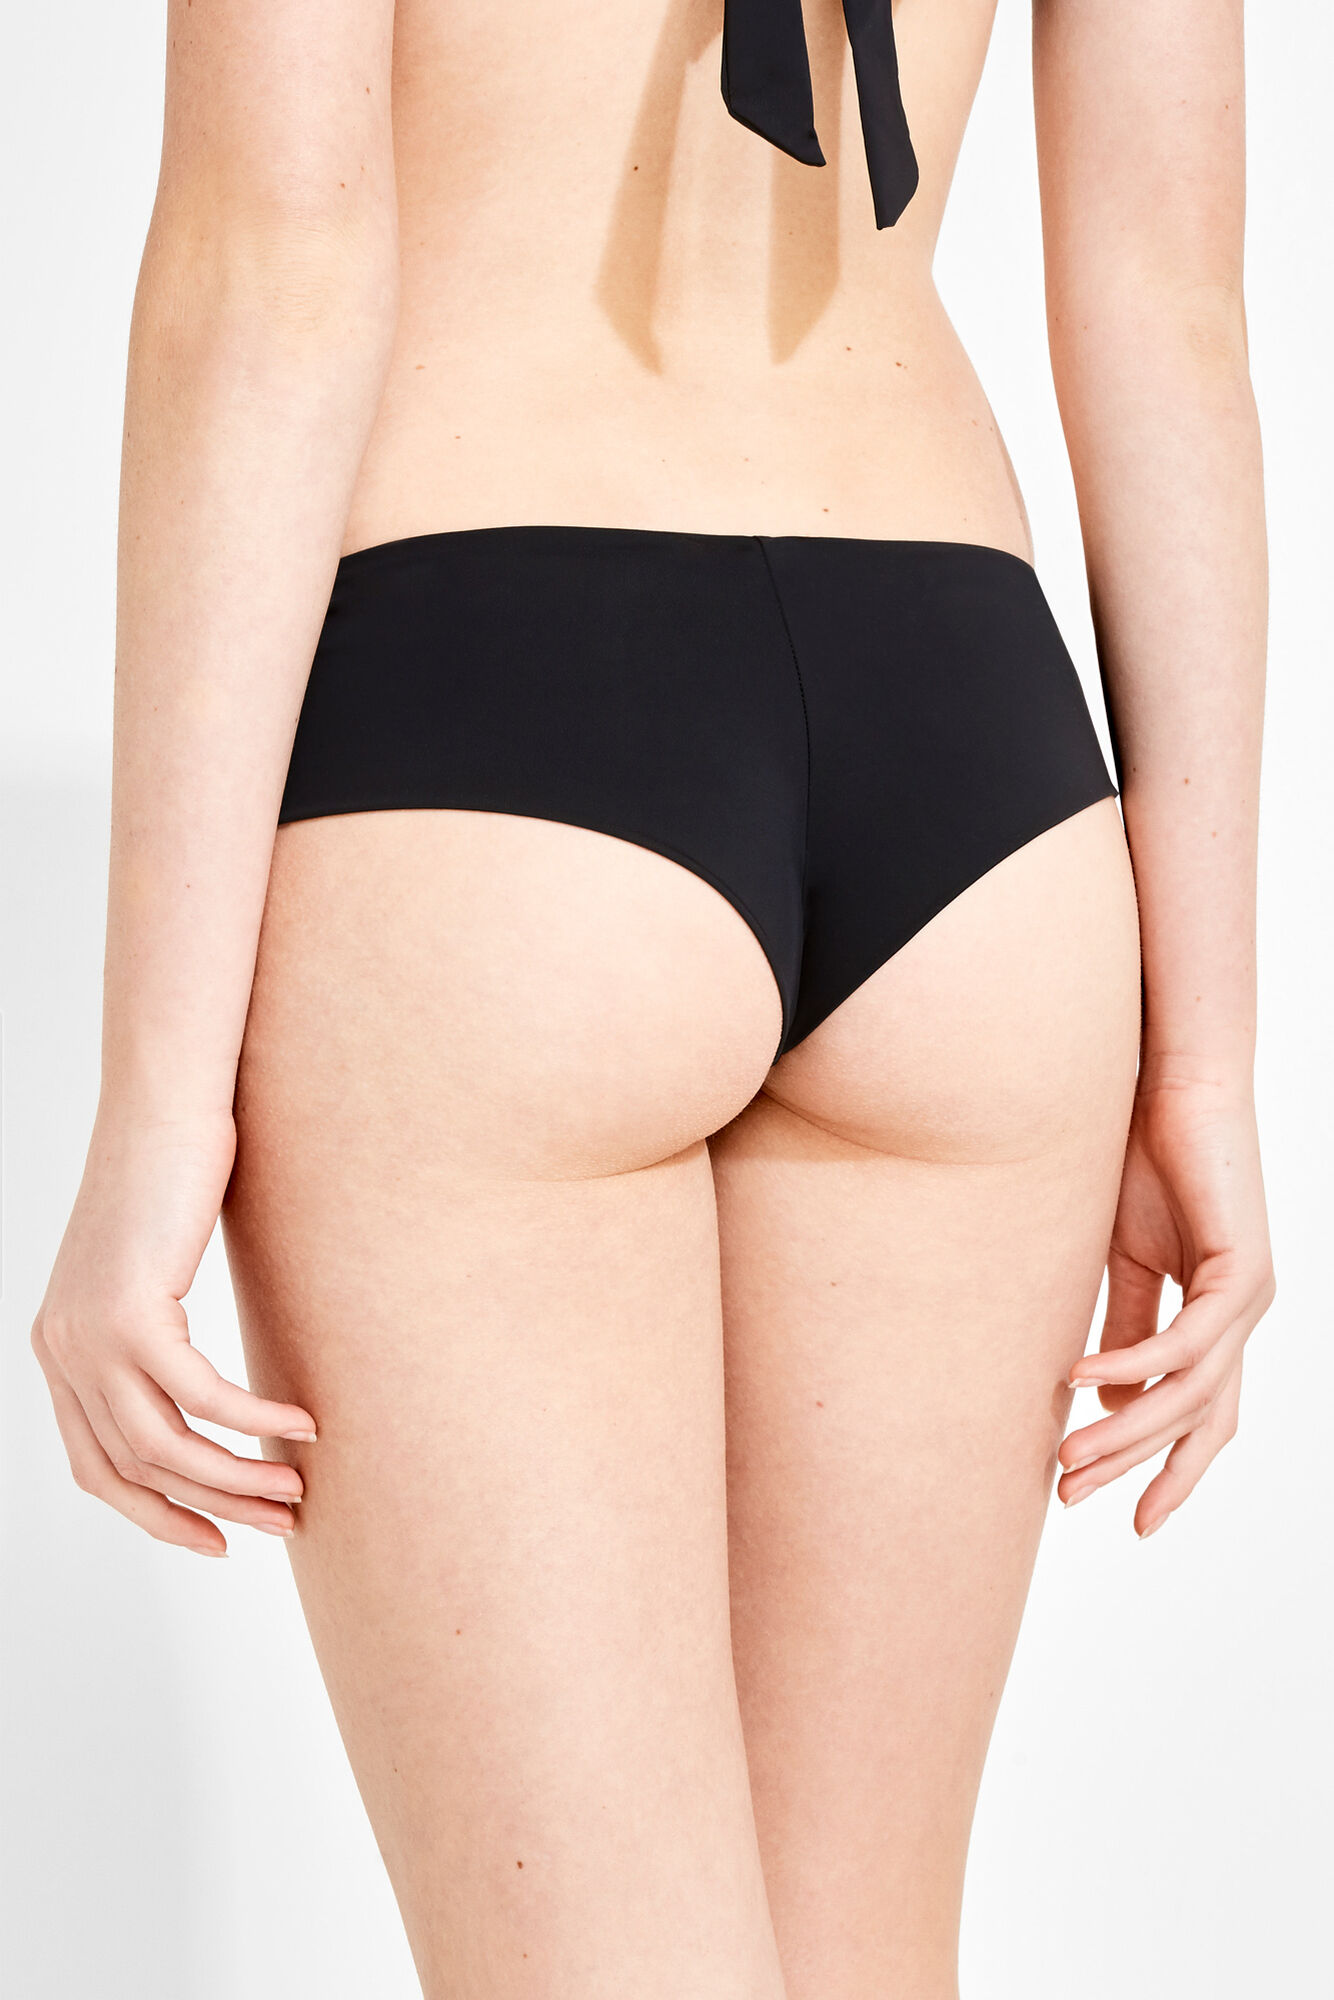 b24339f3d3dd Braga de bikini culotte brasileño